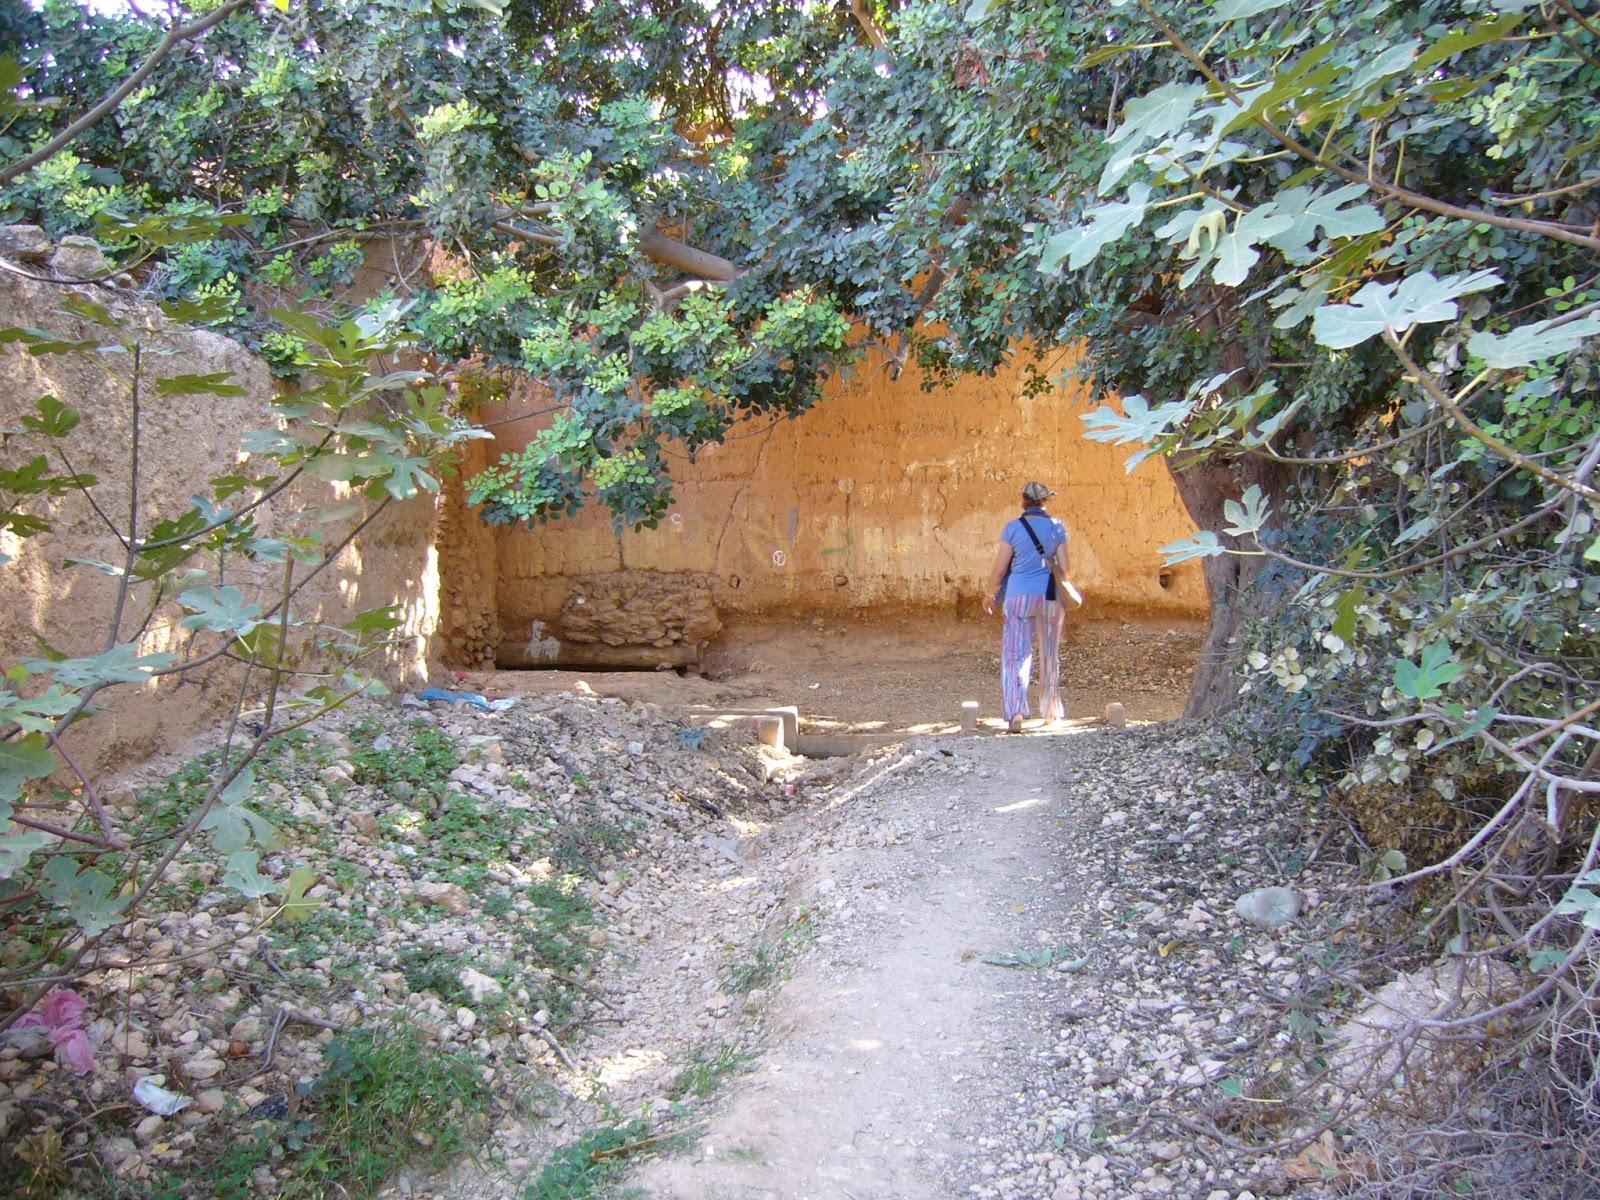 Jardin potager comestible partager d cembre 2015 for Jardin potager 2015